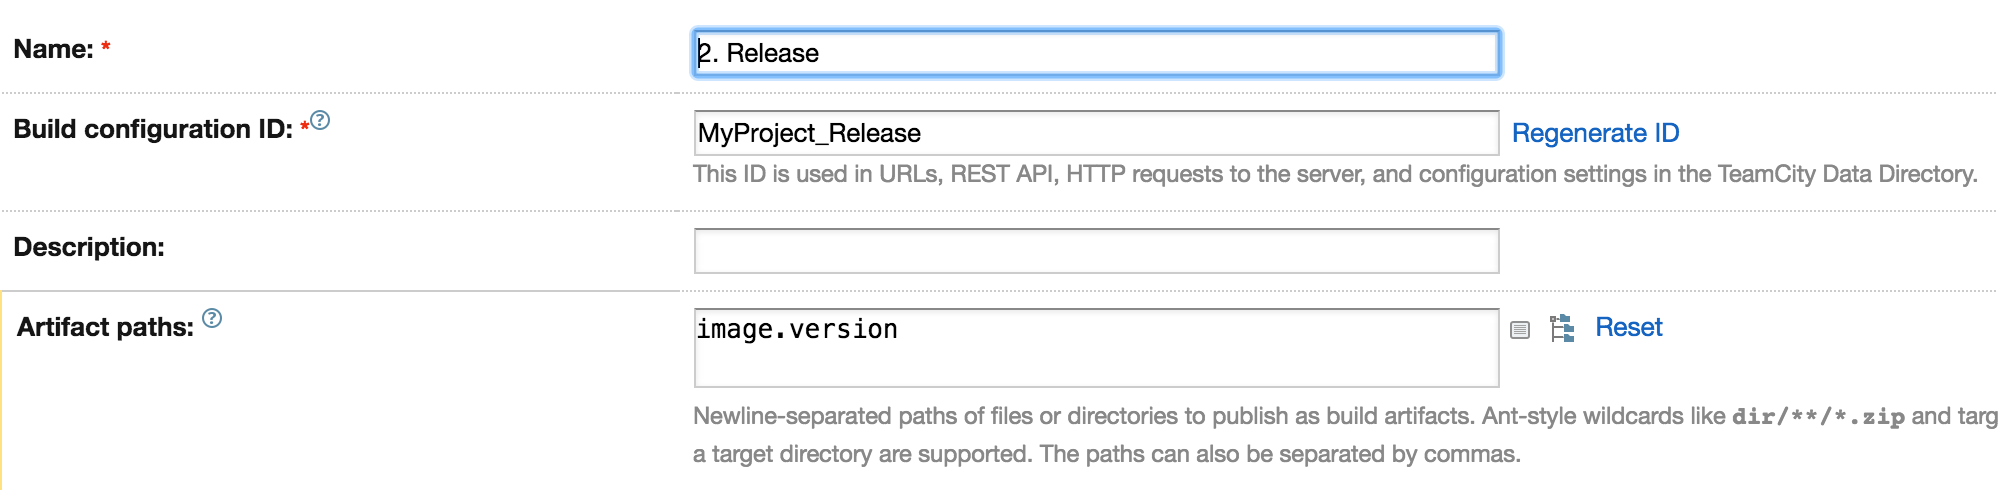 Release Configuration